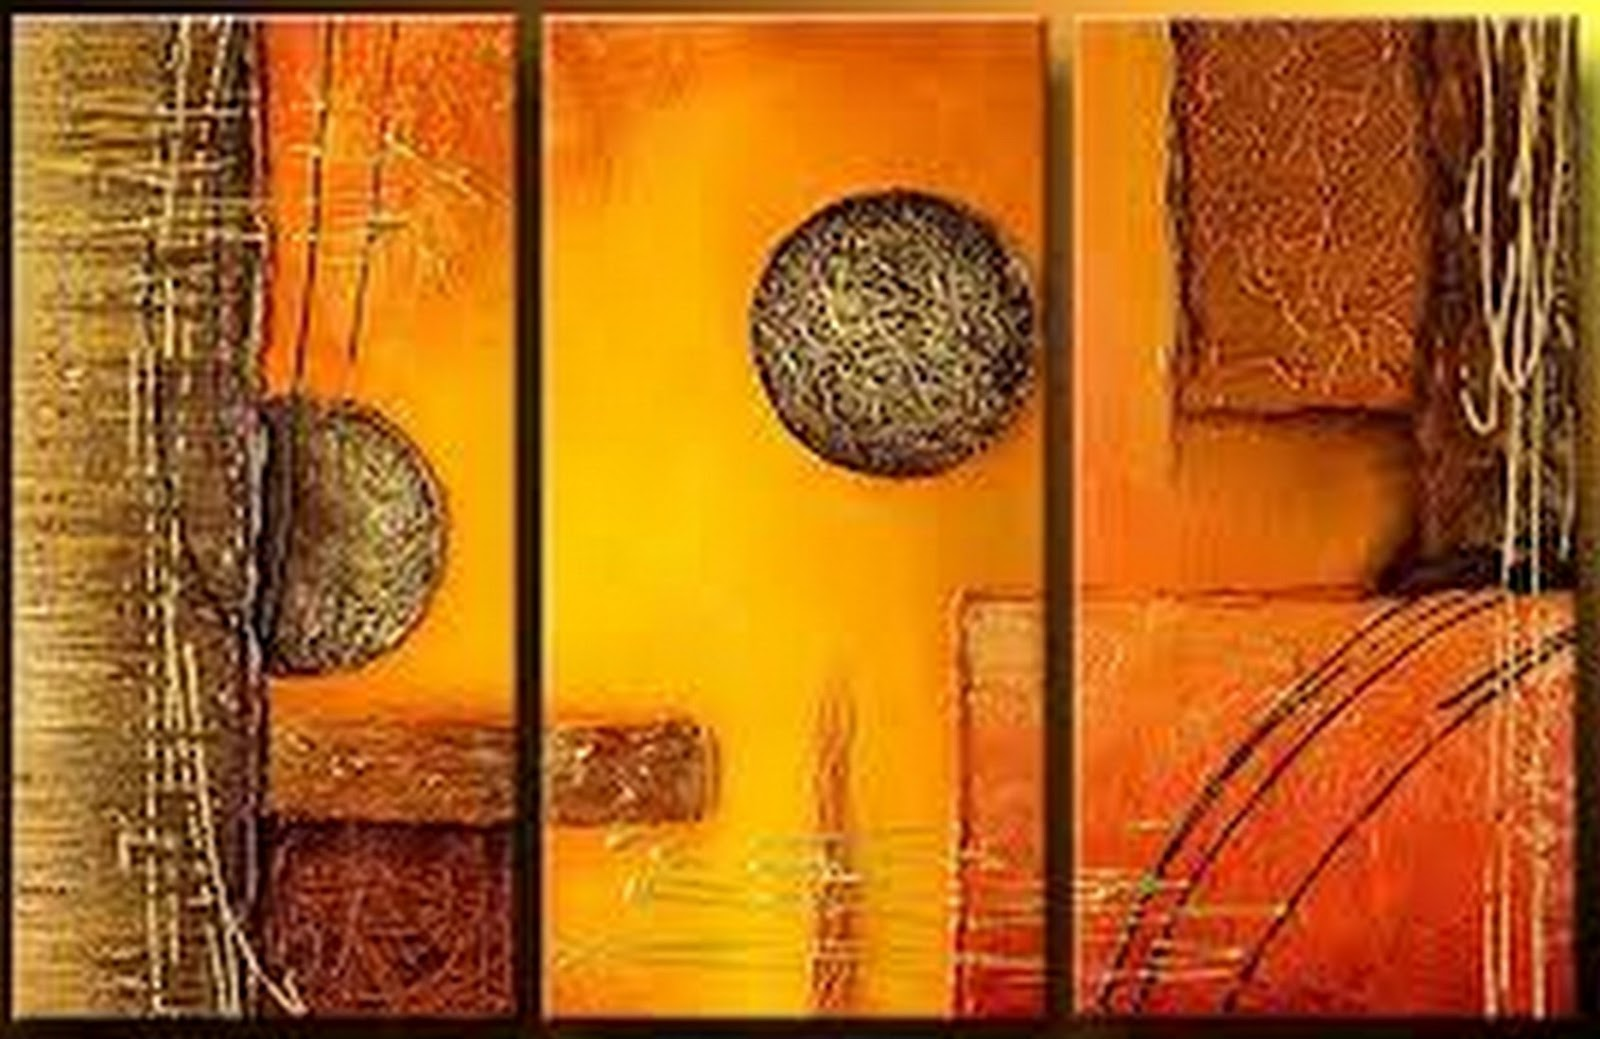 Arte pinturas leo cuadros tr pticos modernos - Triptico cuadros modernos ...